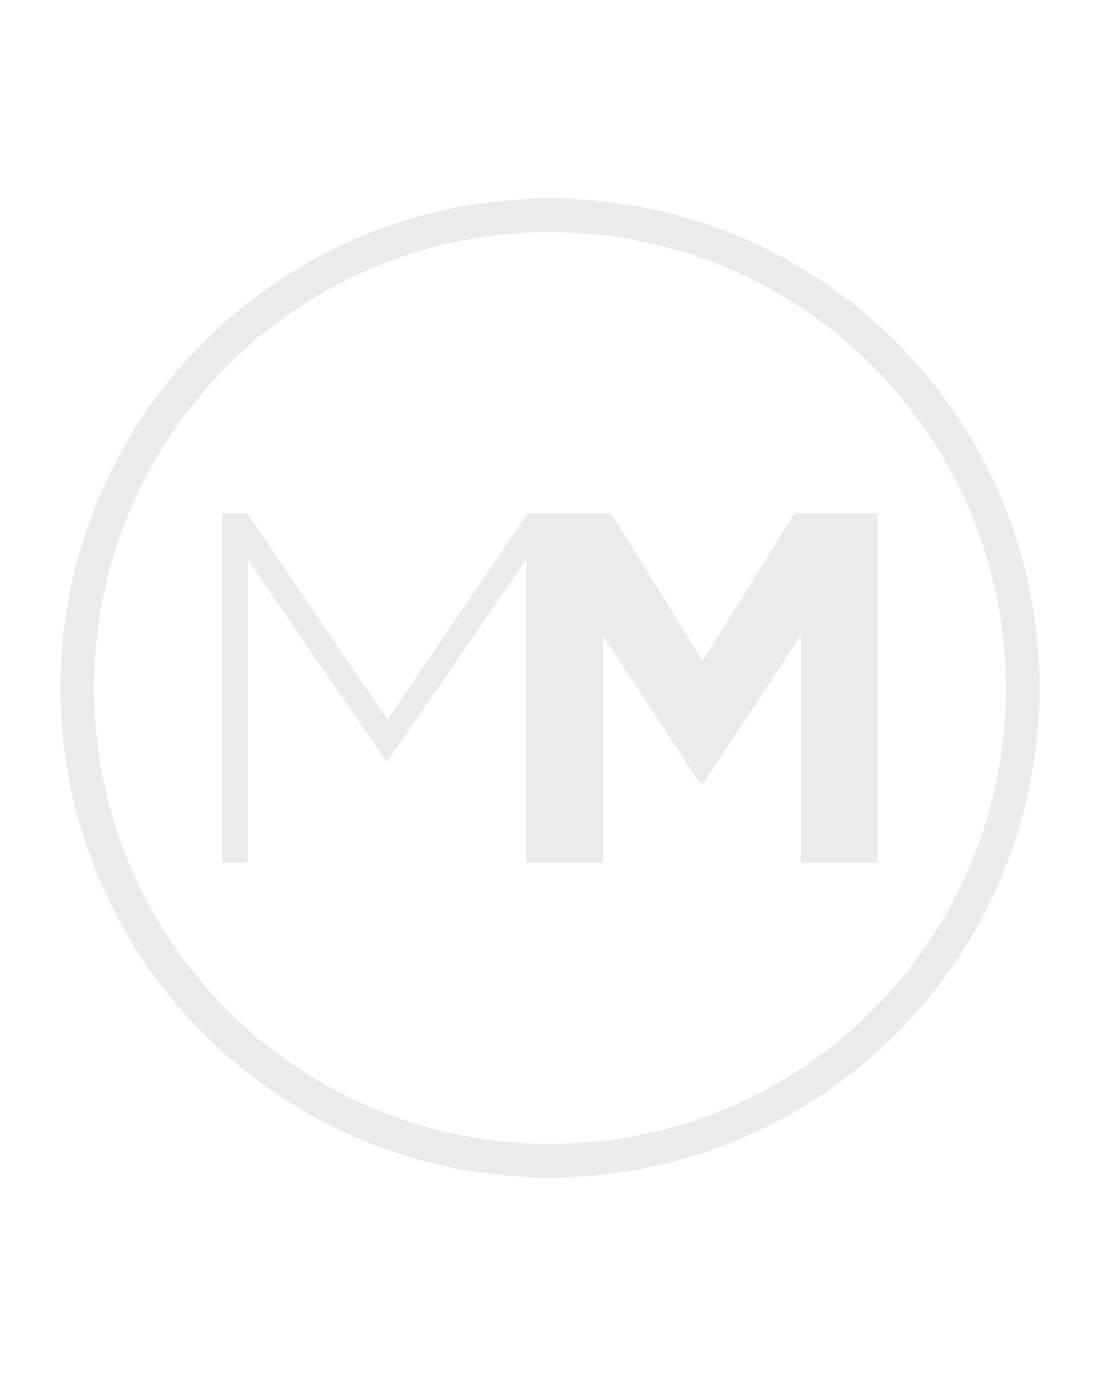 Gt5802 Topje grijs